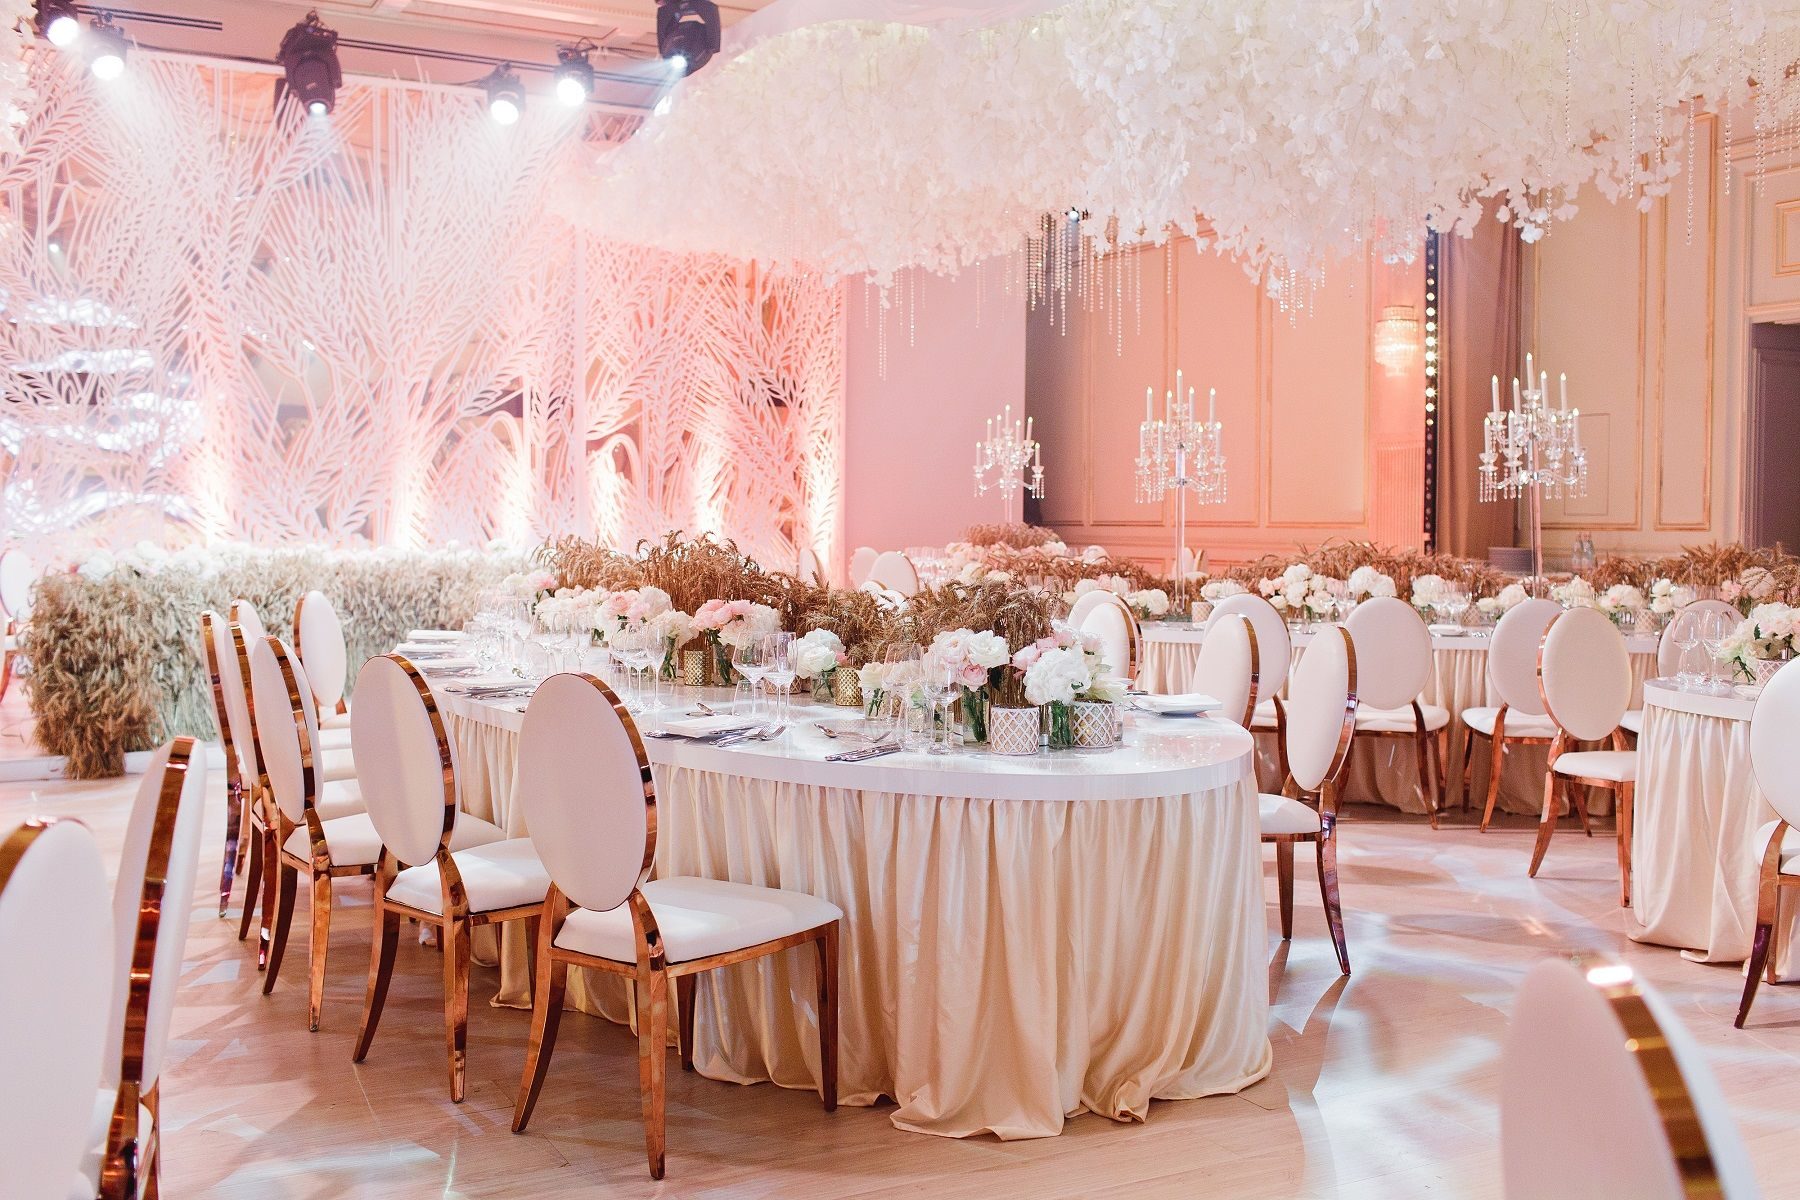 Wedding decoration ideas for hall  Wedding decor grain classic style  Grain wedding  Pinterest